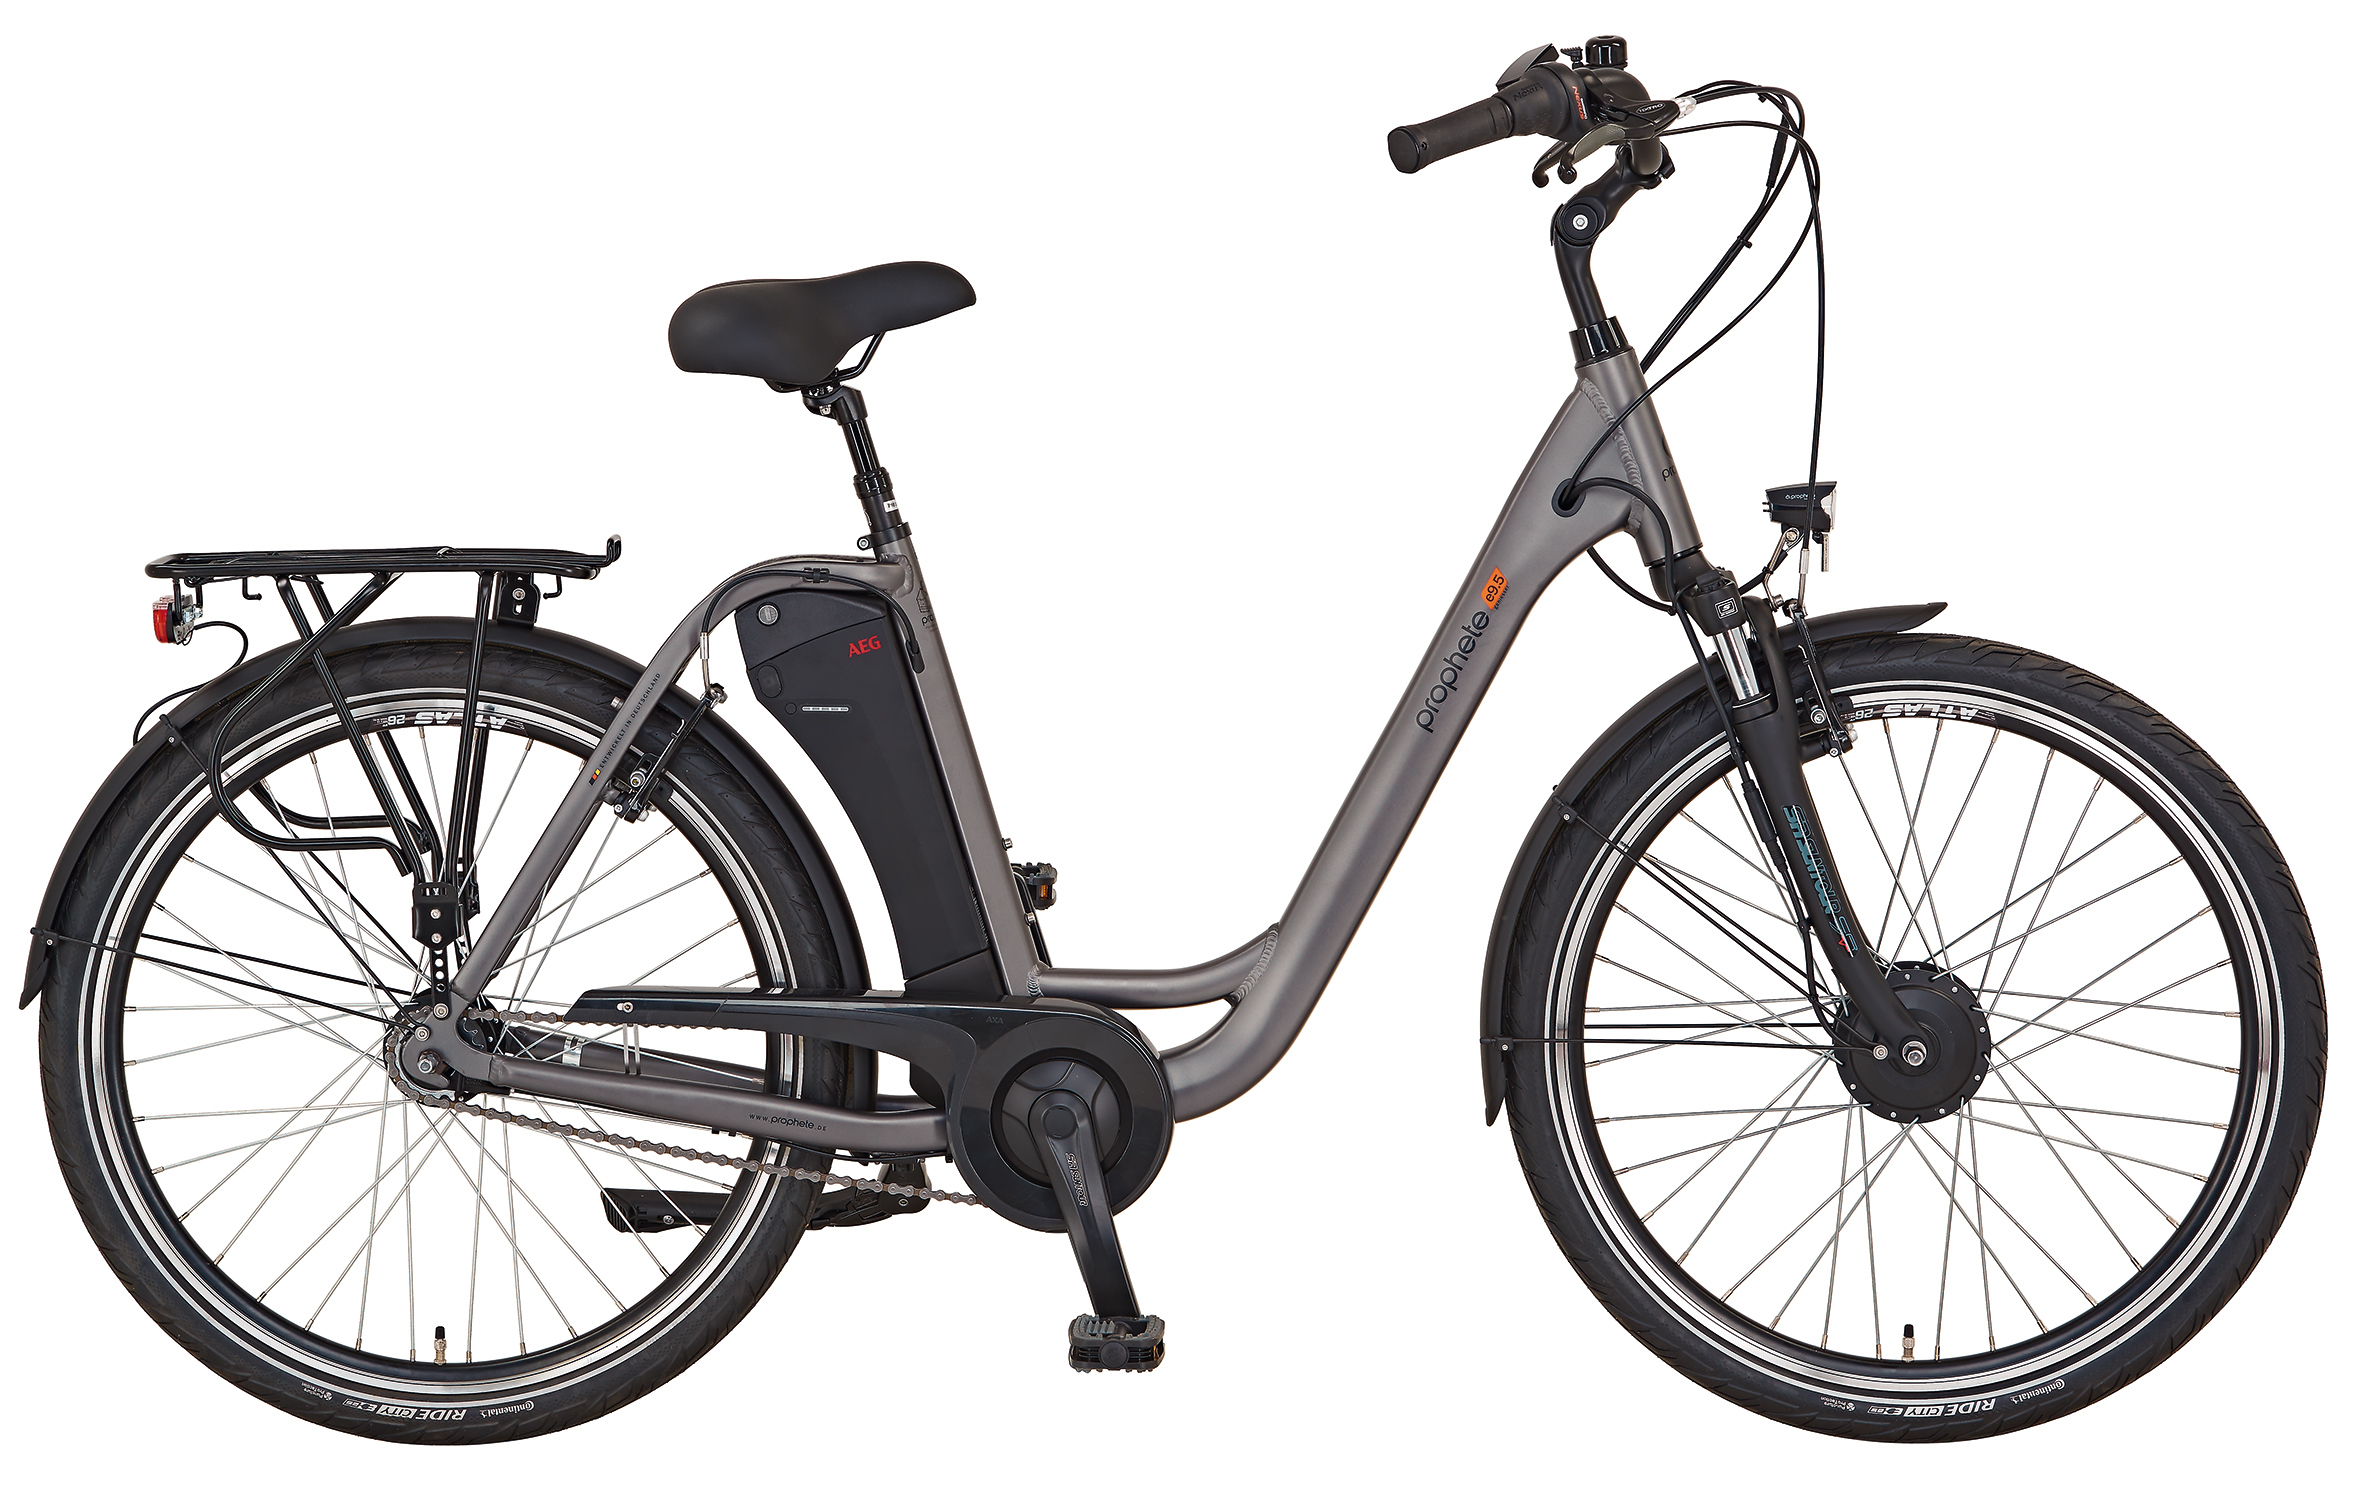 "Prophete Elektrofahrrad / E-Bike Geniesser e9.5 City E-Bike 26"" grau Bild 1"